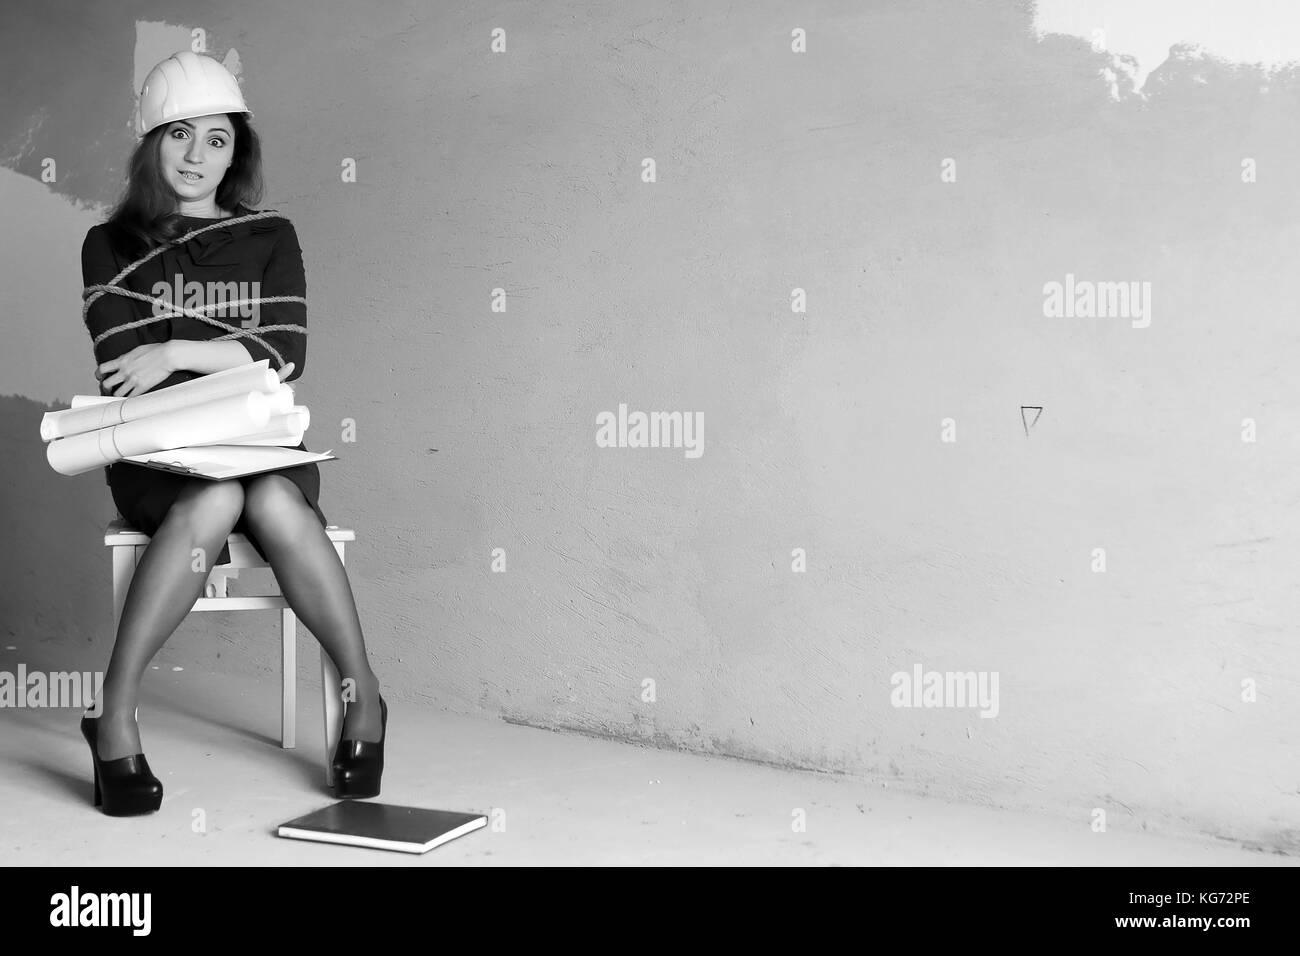 punishment of a slave photos punishment of a slave images alamy. Black Bedroom Furniture Sets. Home Design Ideas